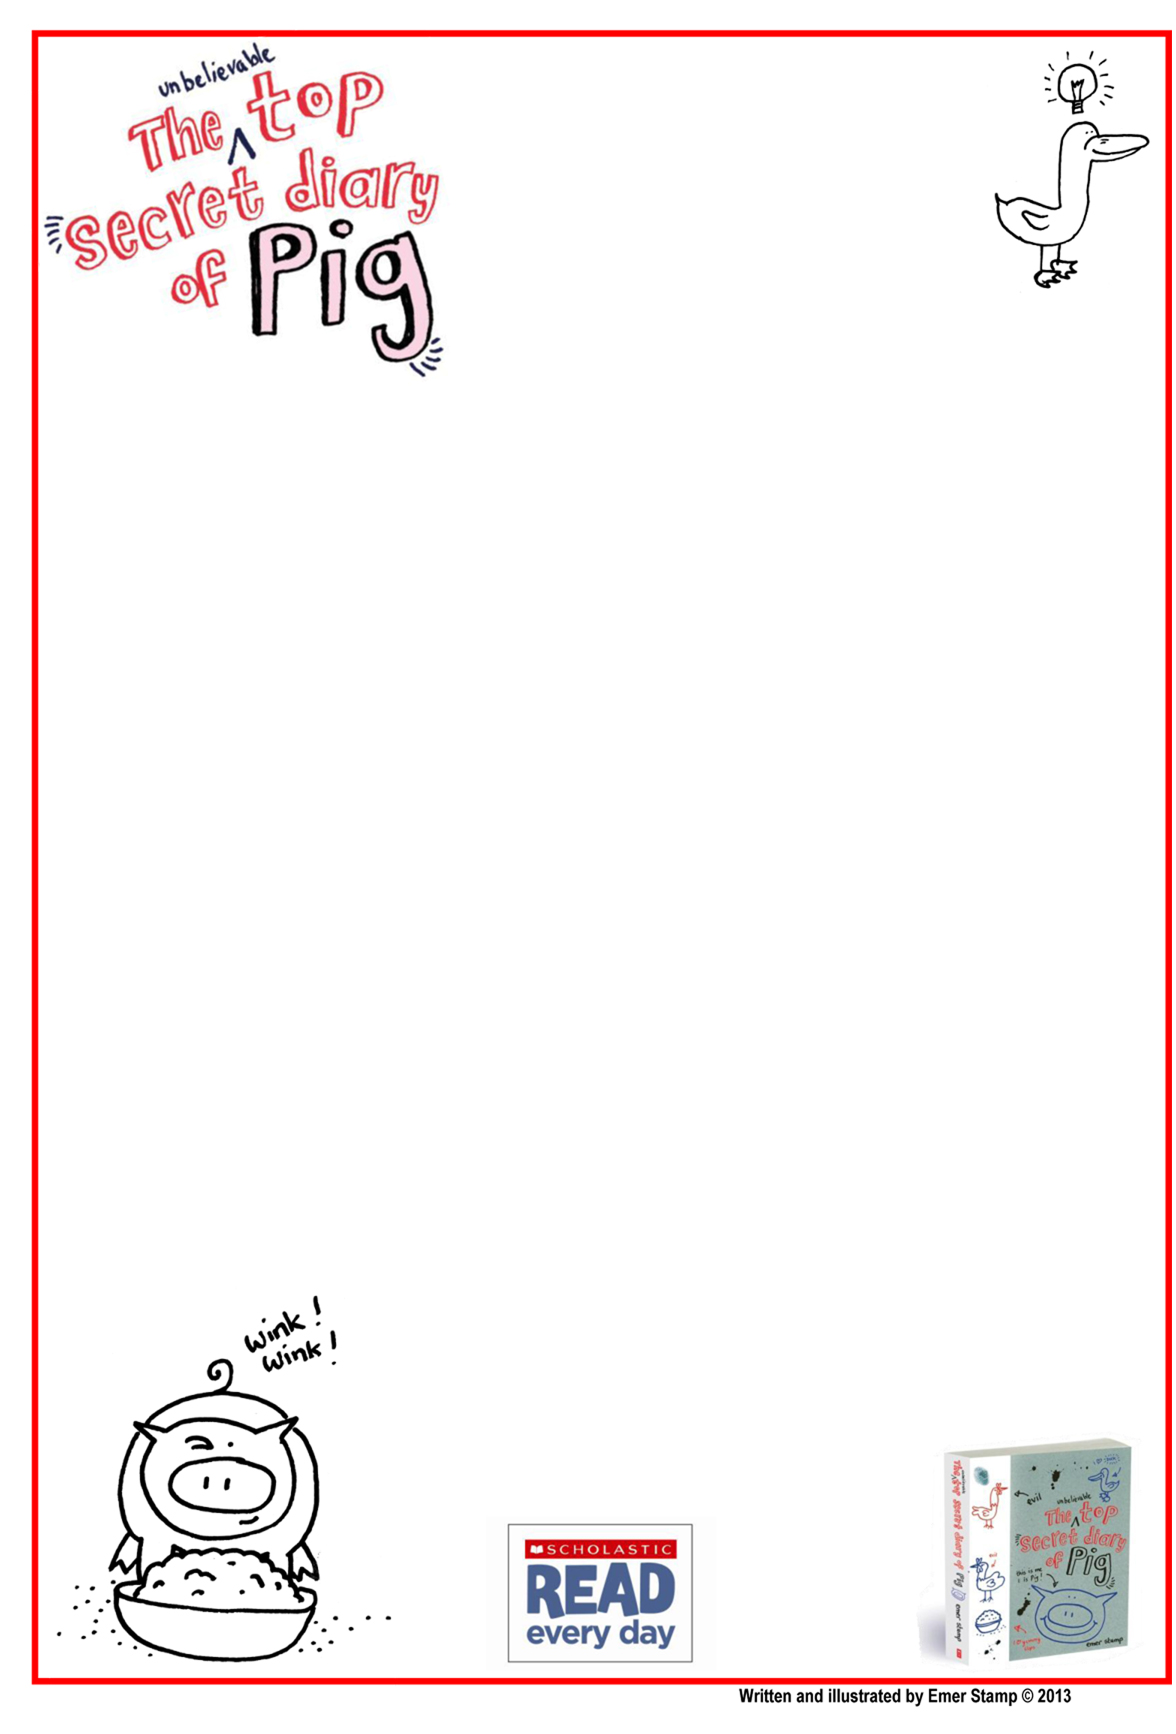 Diarypig act draw 1170057